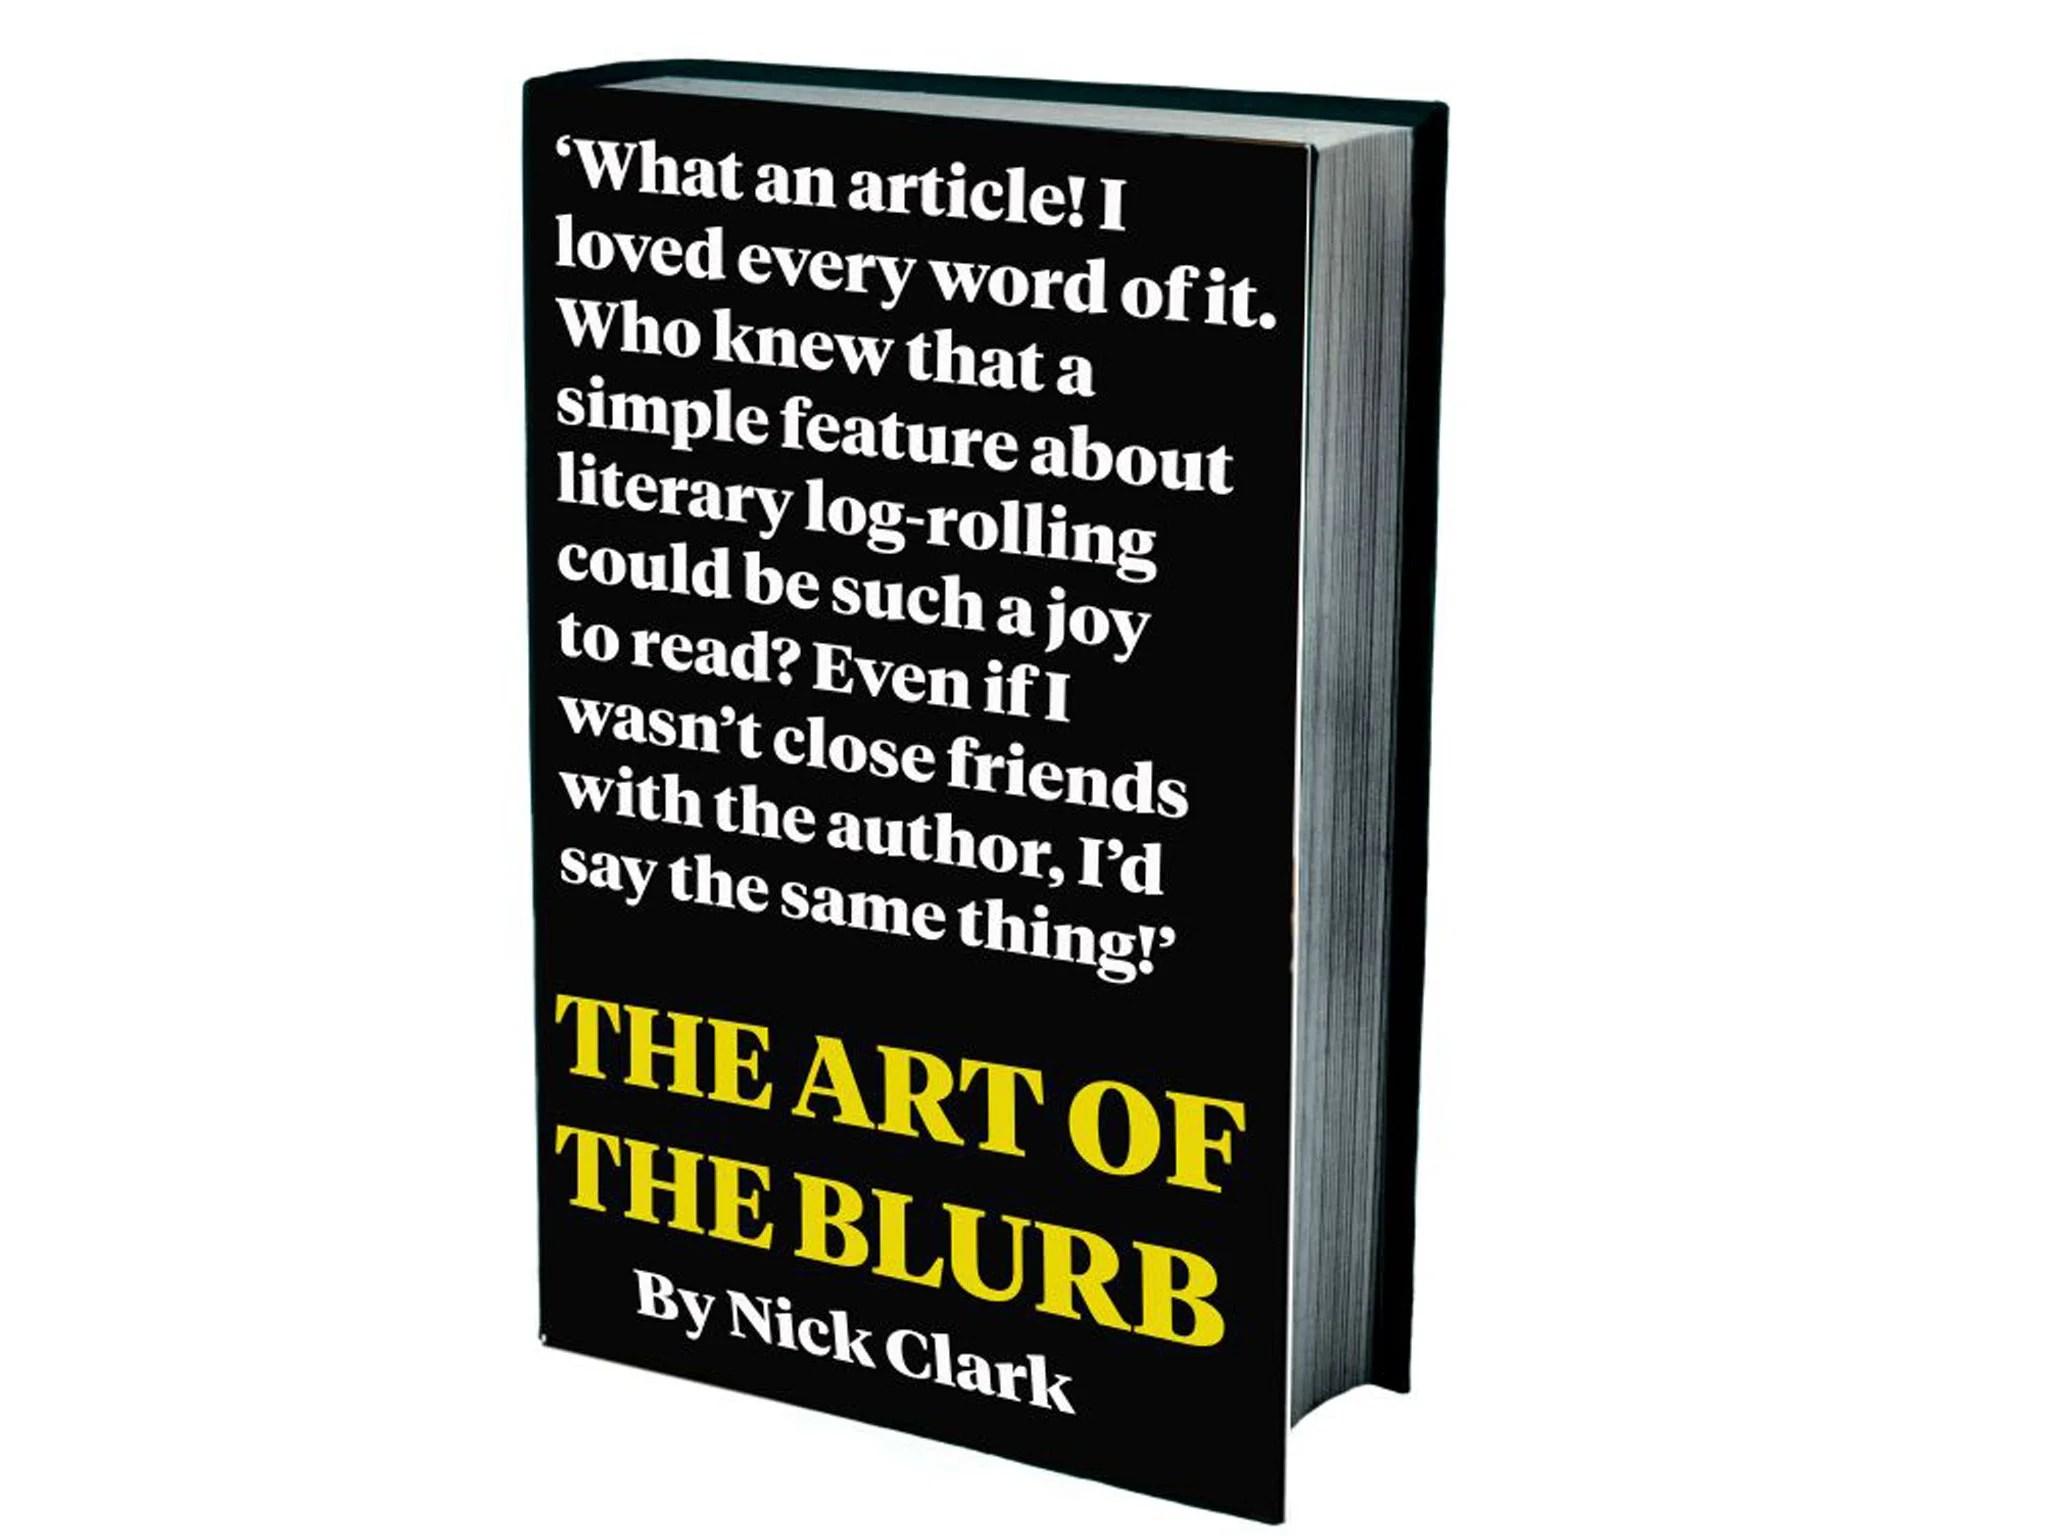 Scaricare Blurb